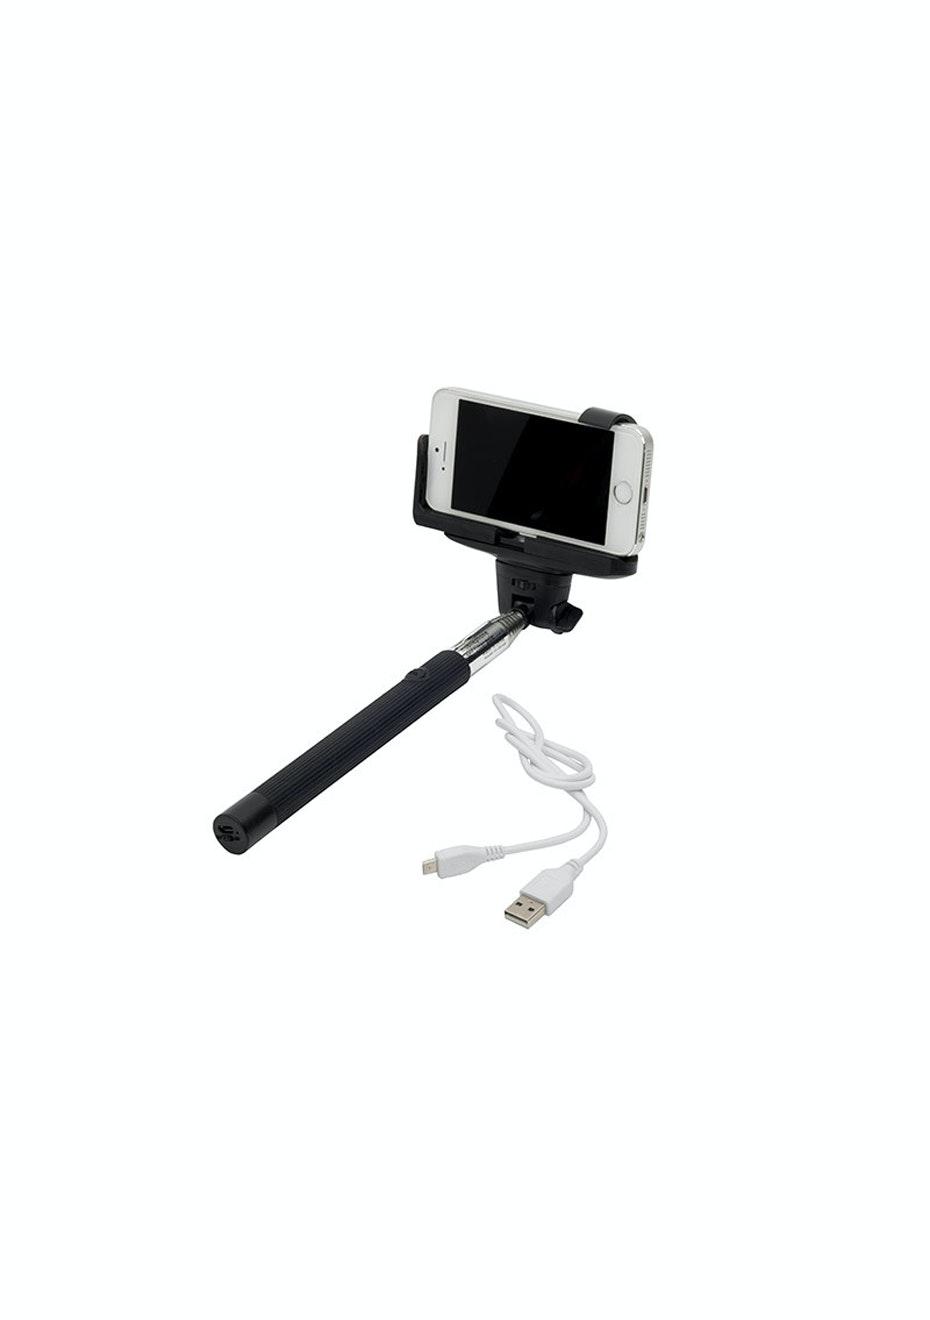 iPower Bluetooth Selfie Stick - Black